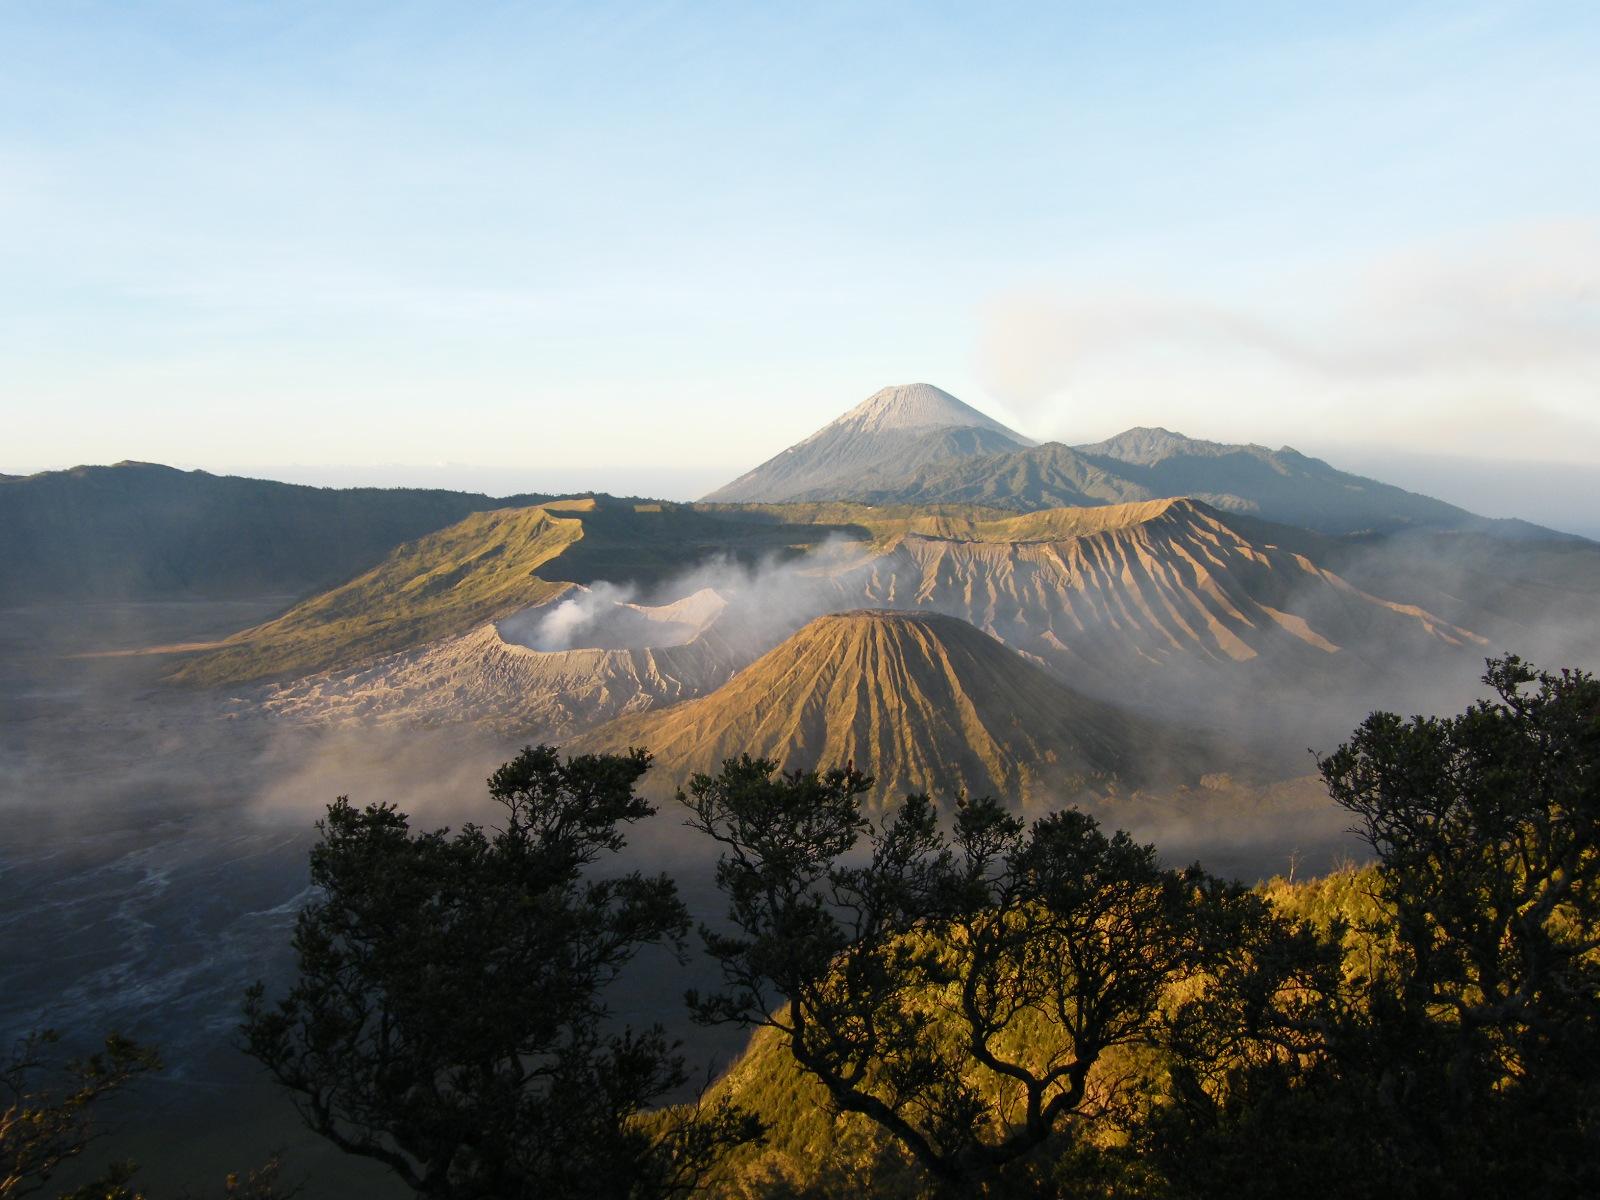 CECEP ASIANA SIANTARA: GUNUNG BROMO Galery, Jawa Timur